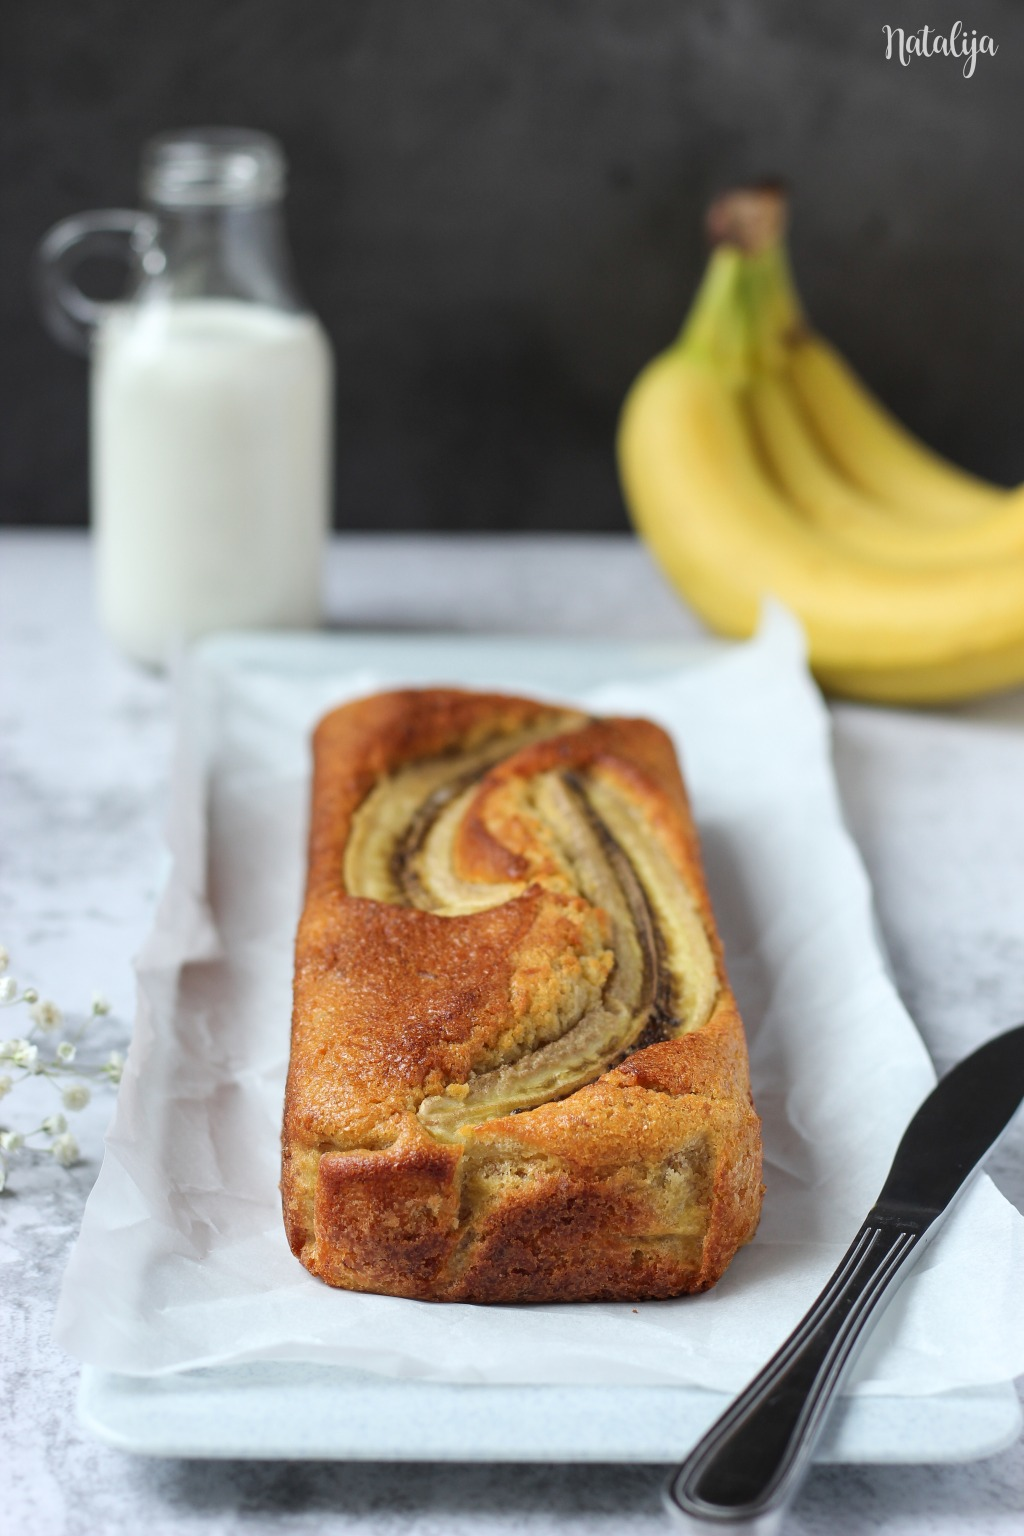 Banana hleb